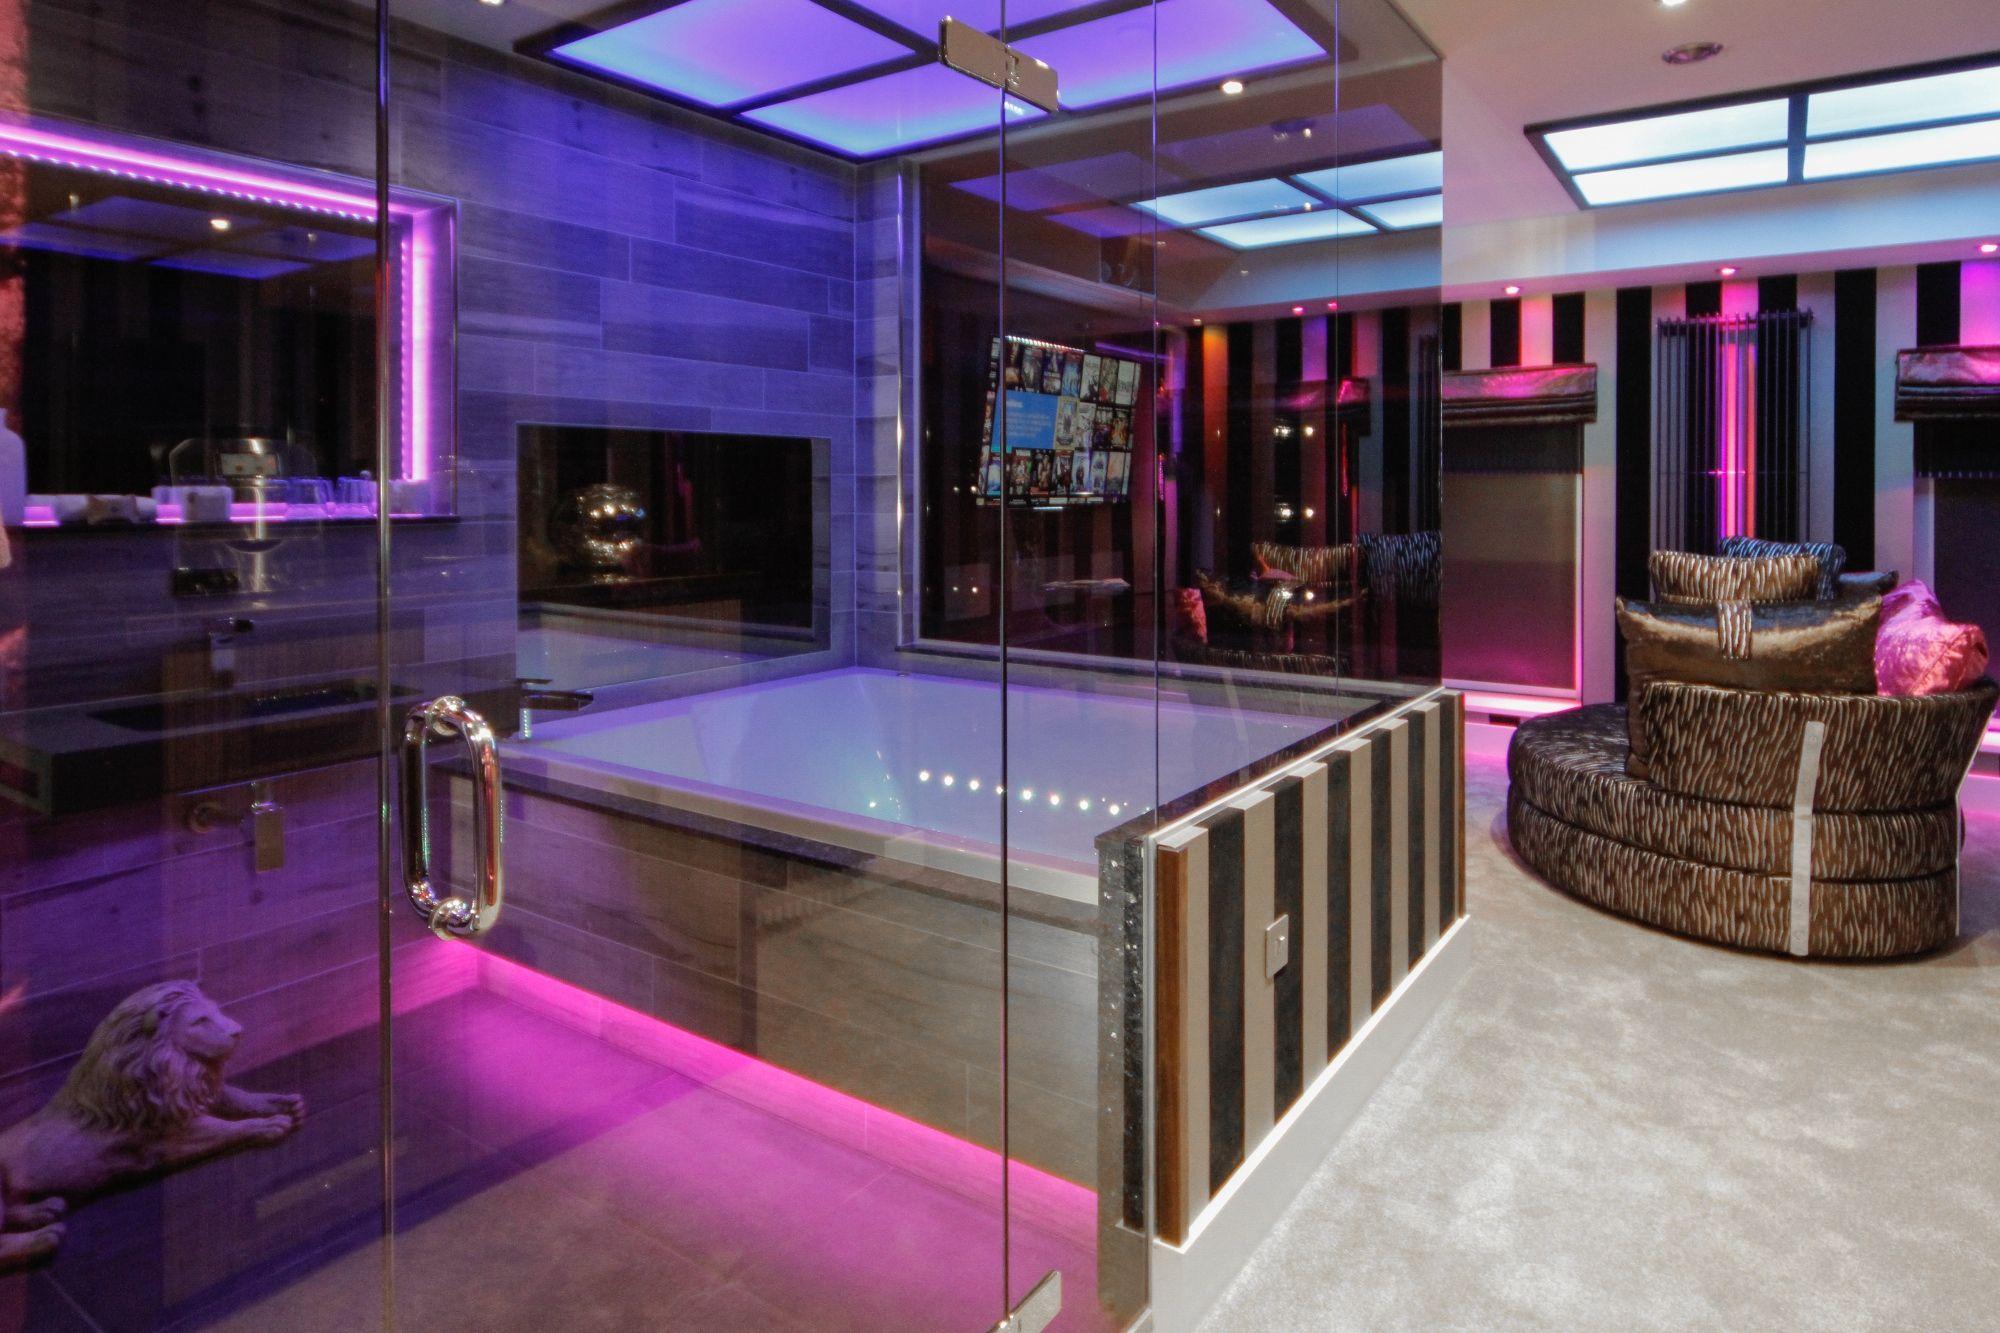 Church Suites Room For Romance Luxury Hotel Weekend Break Hotels